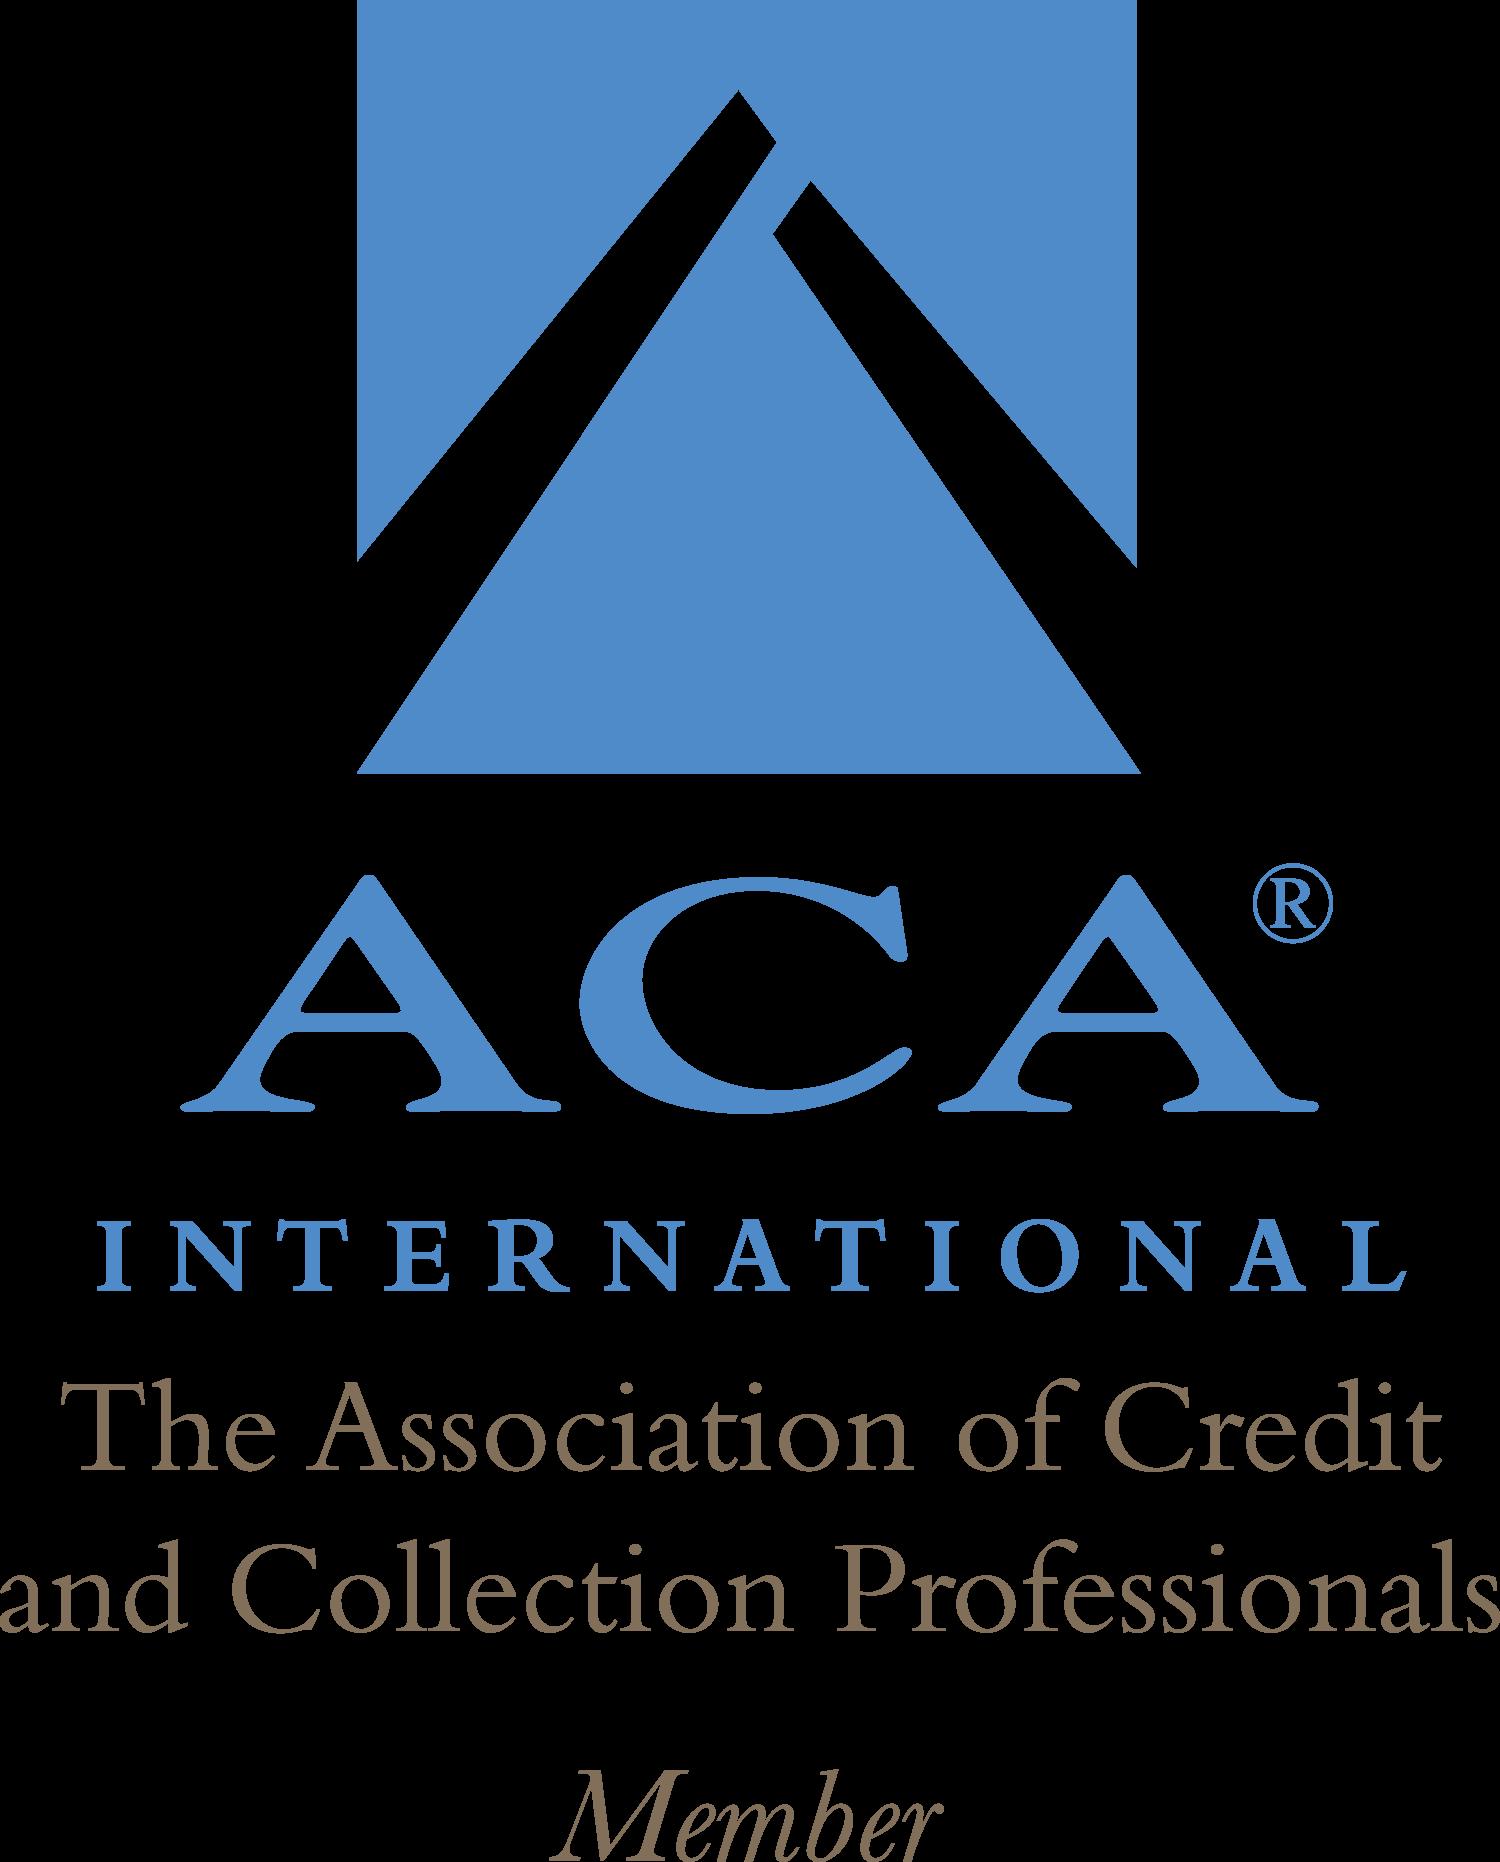 https://0201.nccdn.net/1_2/000/000/177/48a/aca-r-member-rgb-1500x1862.png